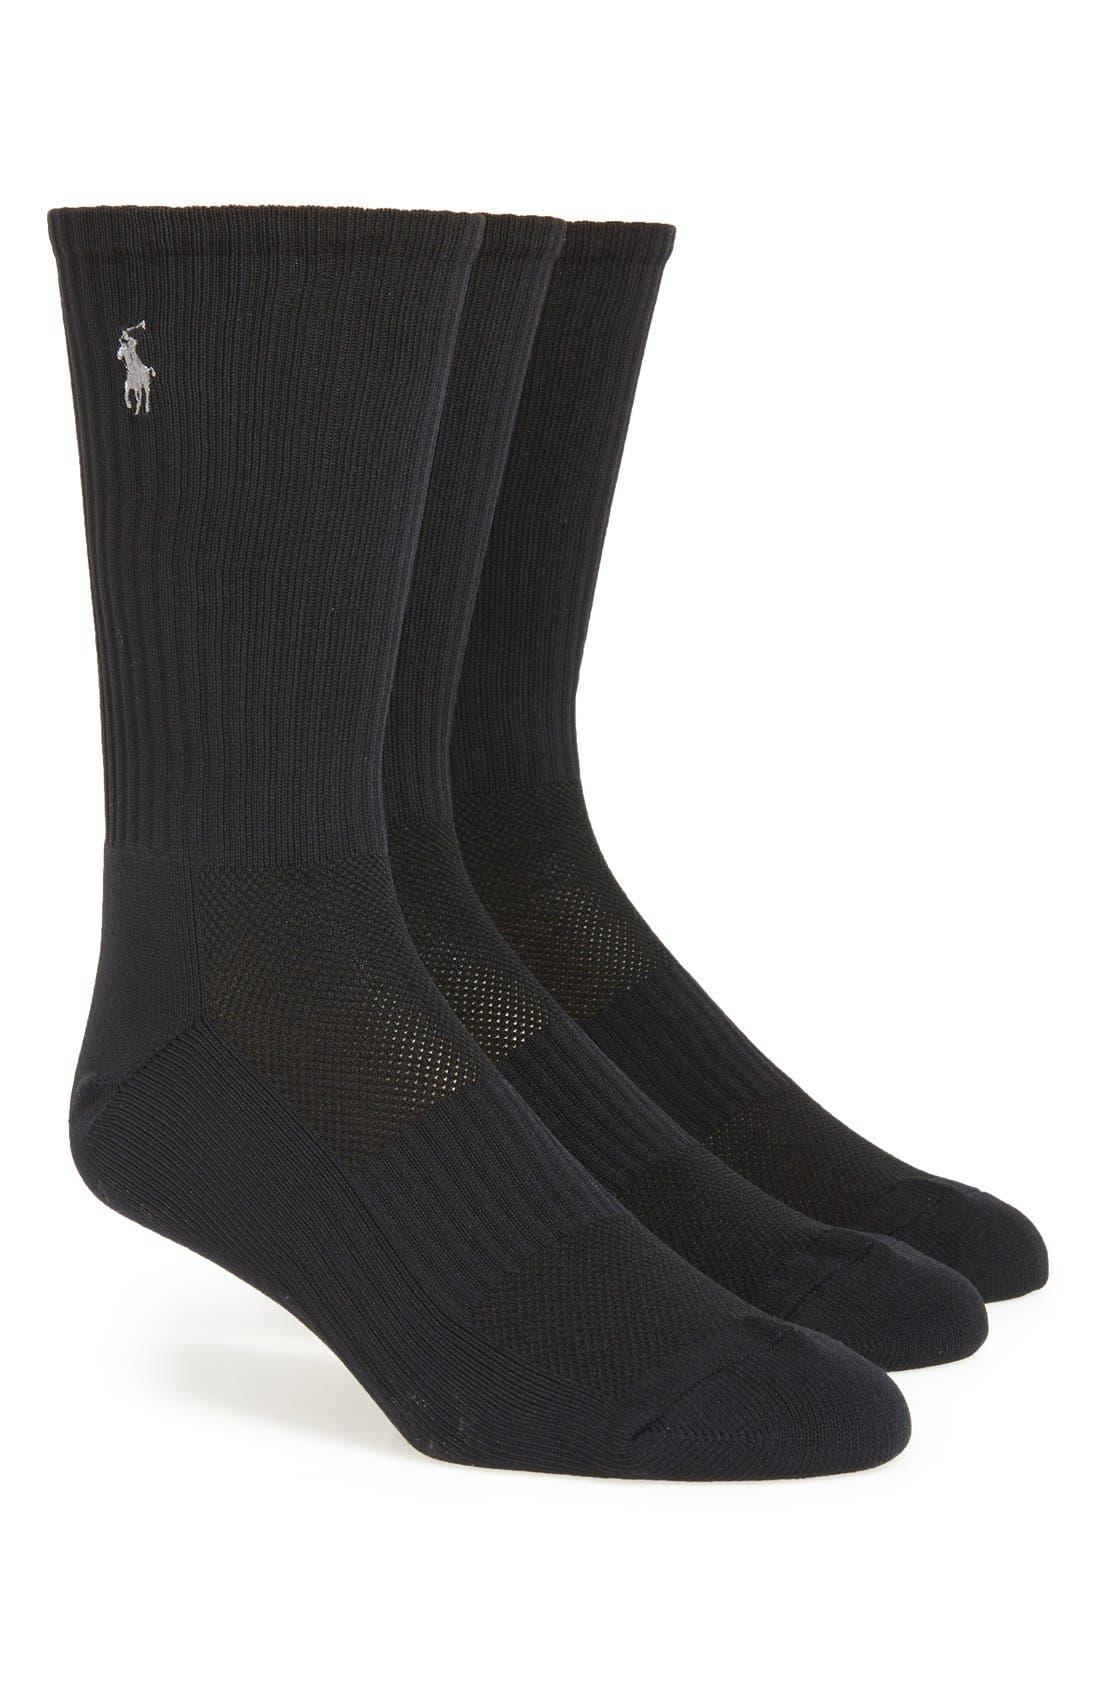 POLO RALPH LAUREN Tech Athletic Crew Socks, Main, color, BLACK